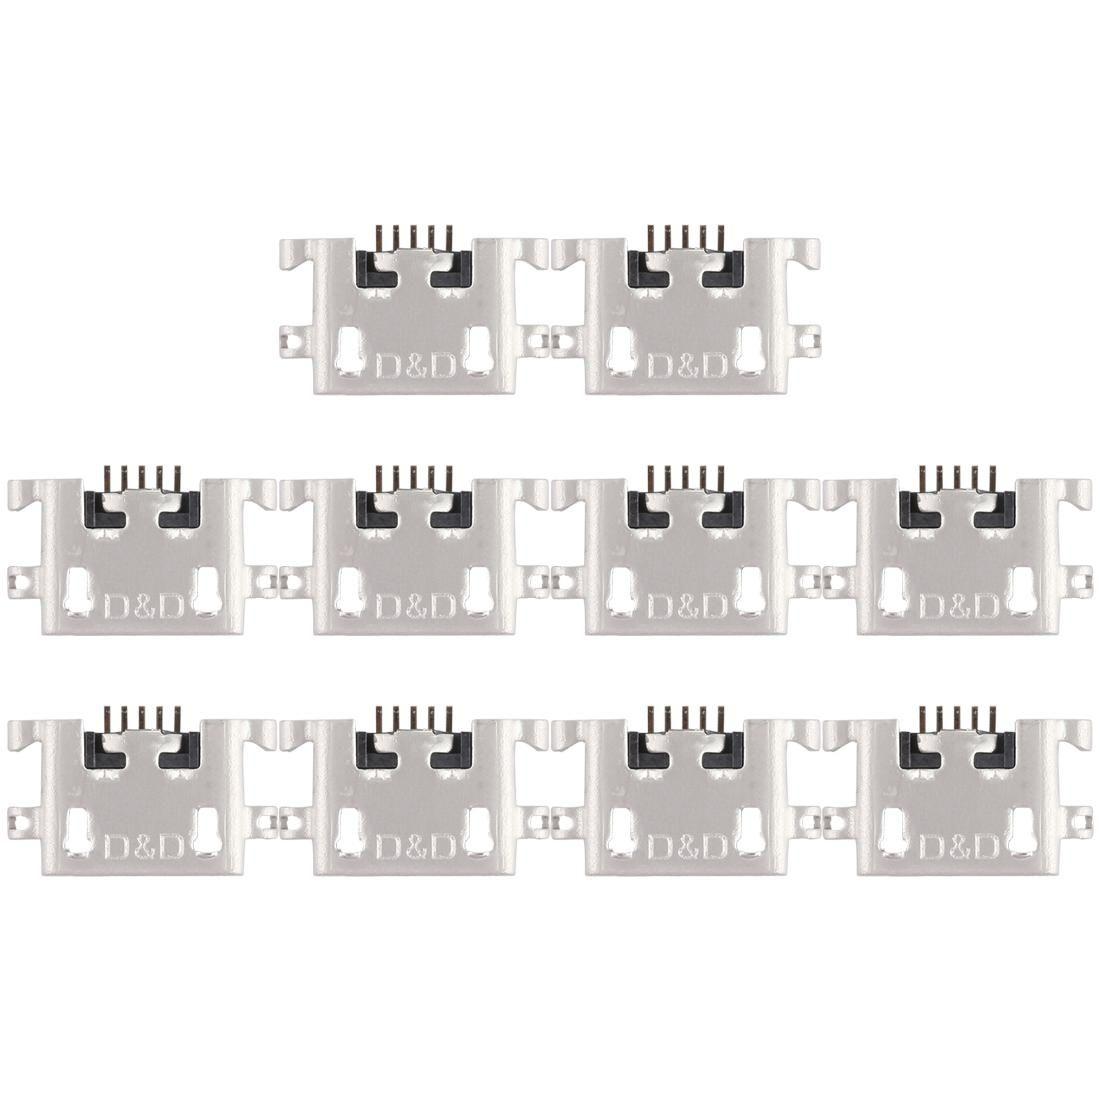 10 PCS Charging Port Connecteur pour Xiaomi redmi Note 3 / redmi 6 / 6A redmi